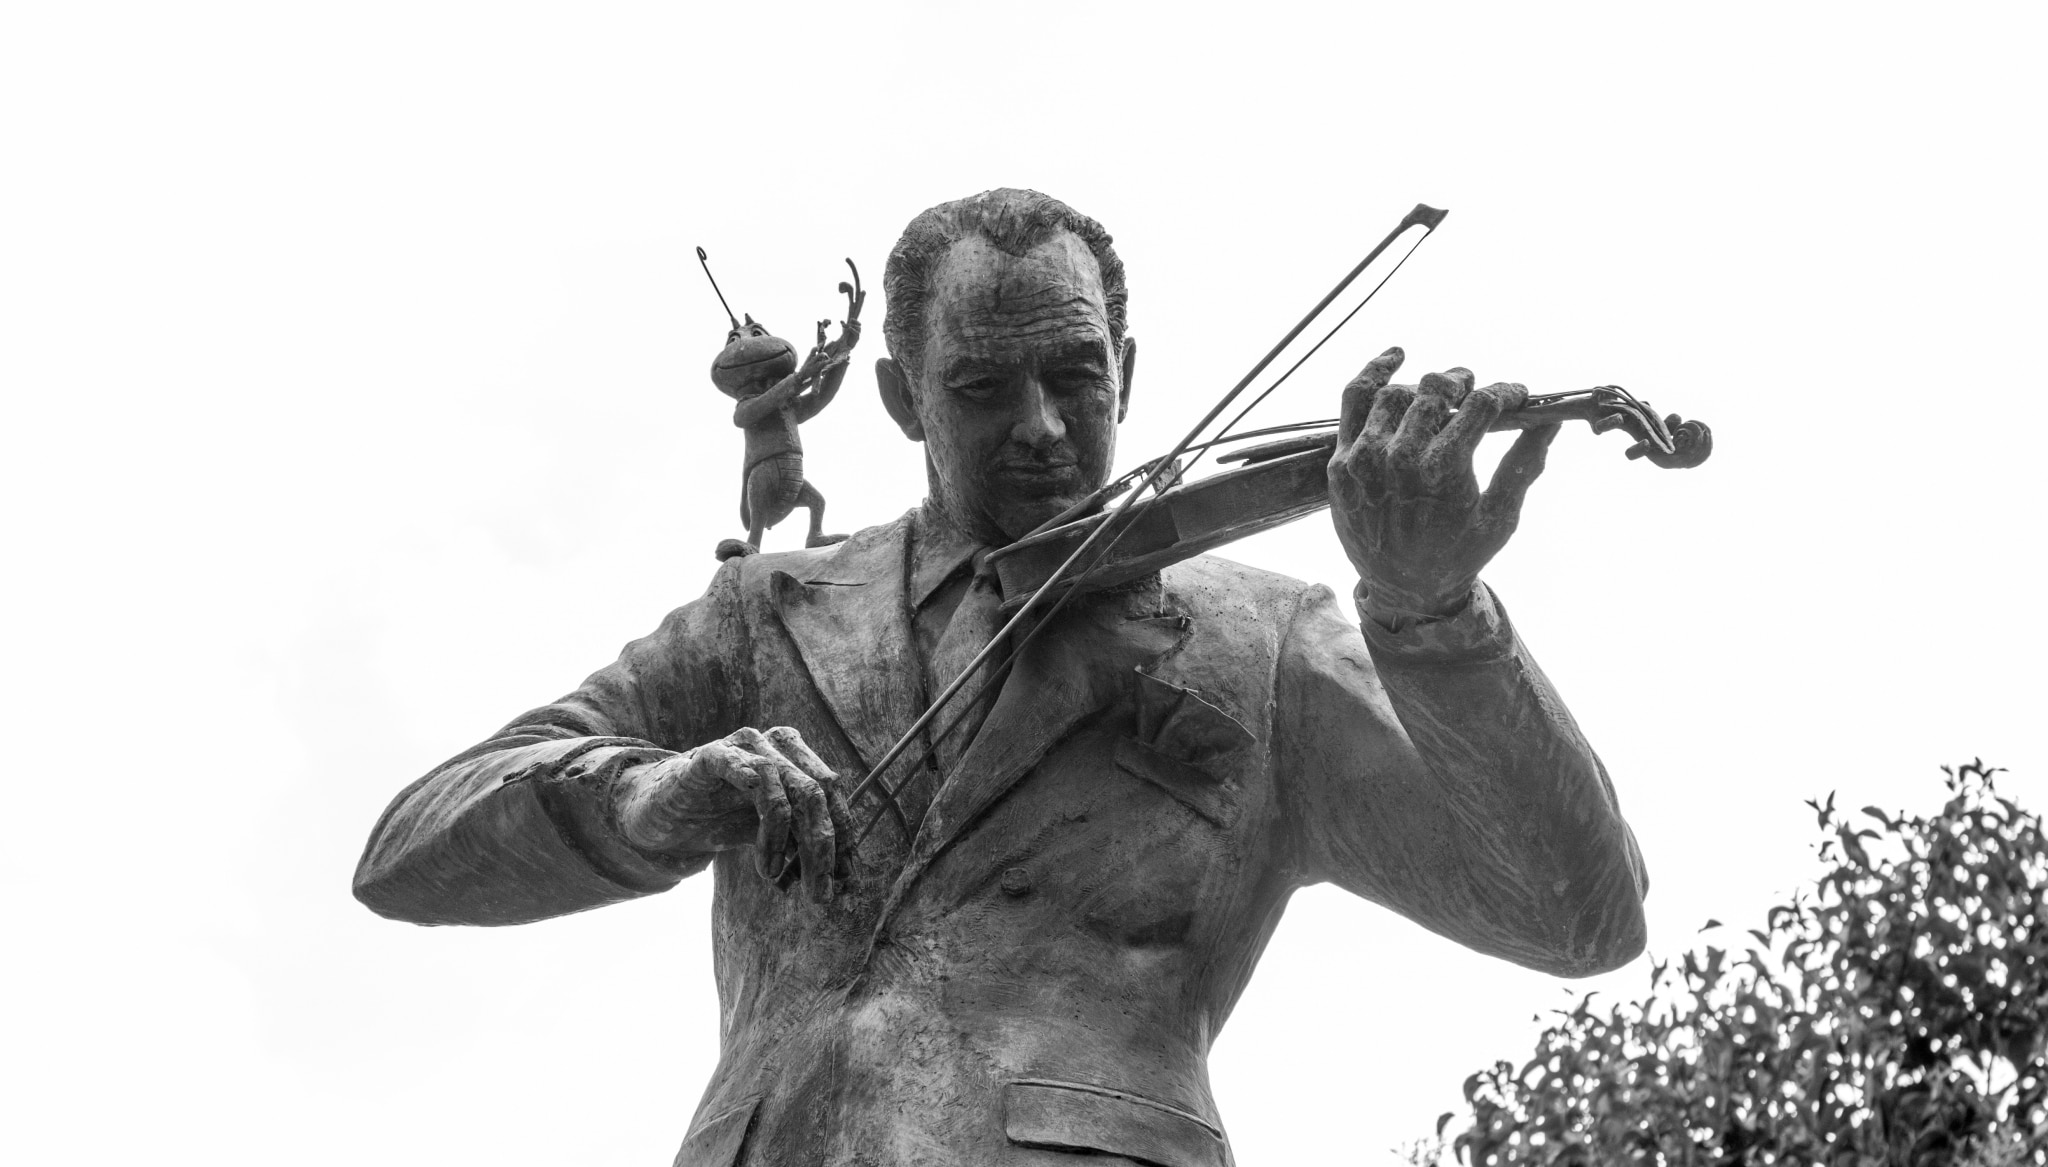 Escultura de Francisco Gabilondo Soler con Cri Cri en su hombro